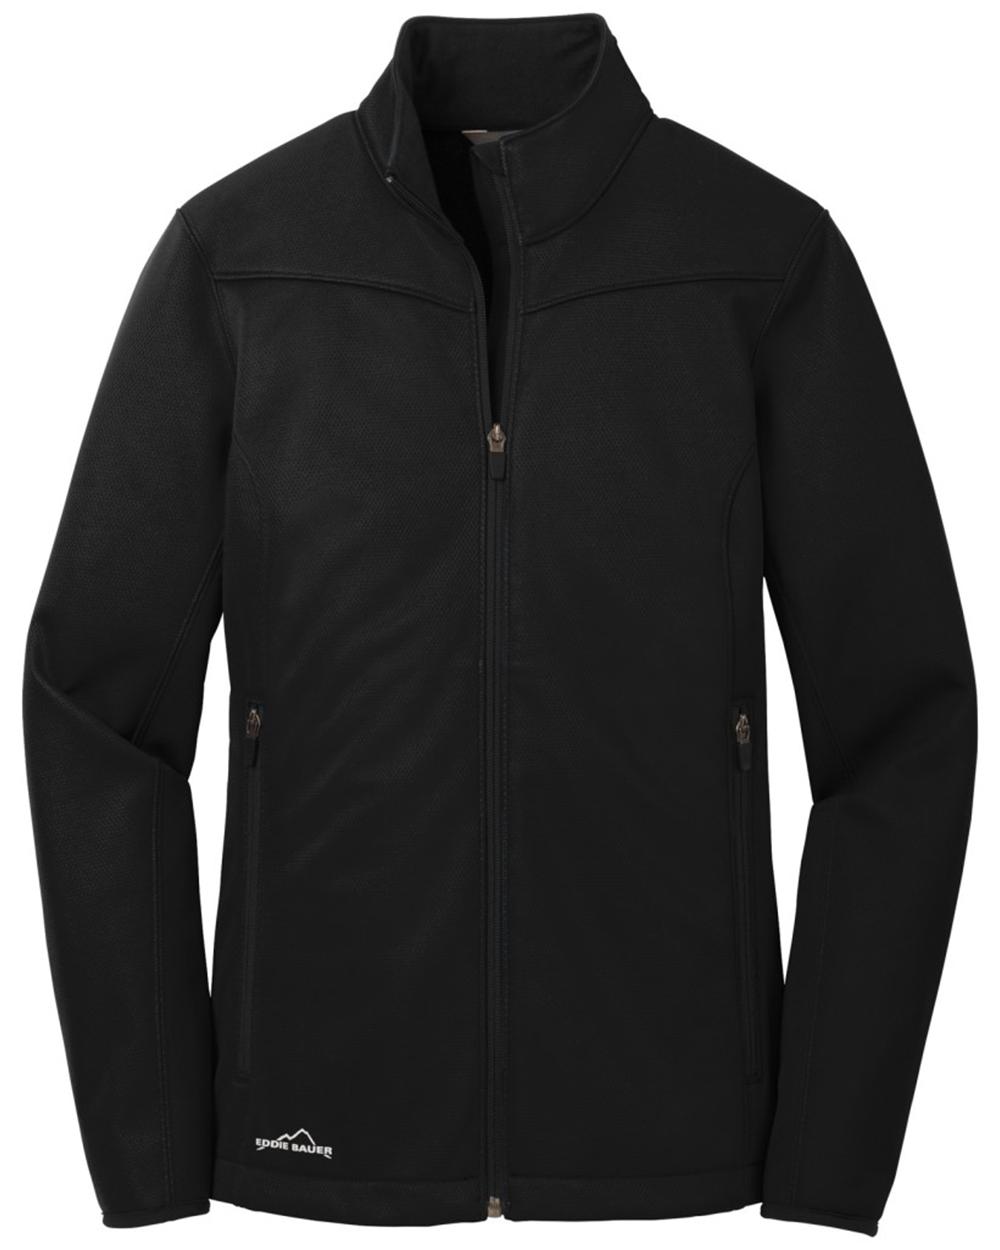 Weather Resist Soft Shell Ladies' Jacket